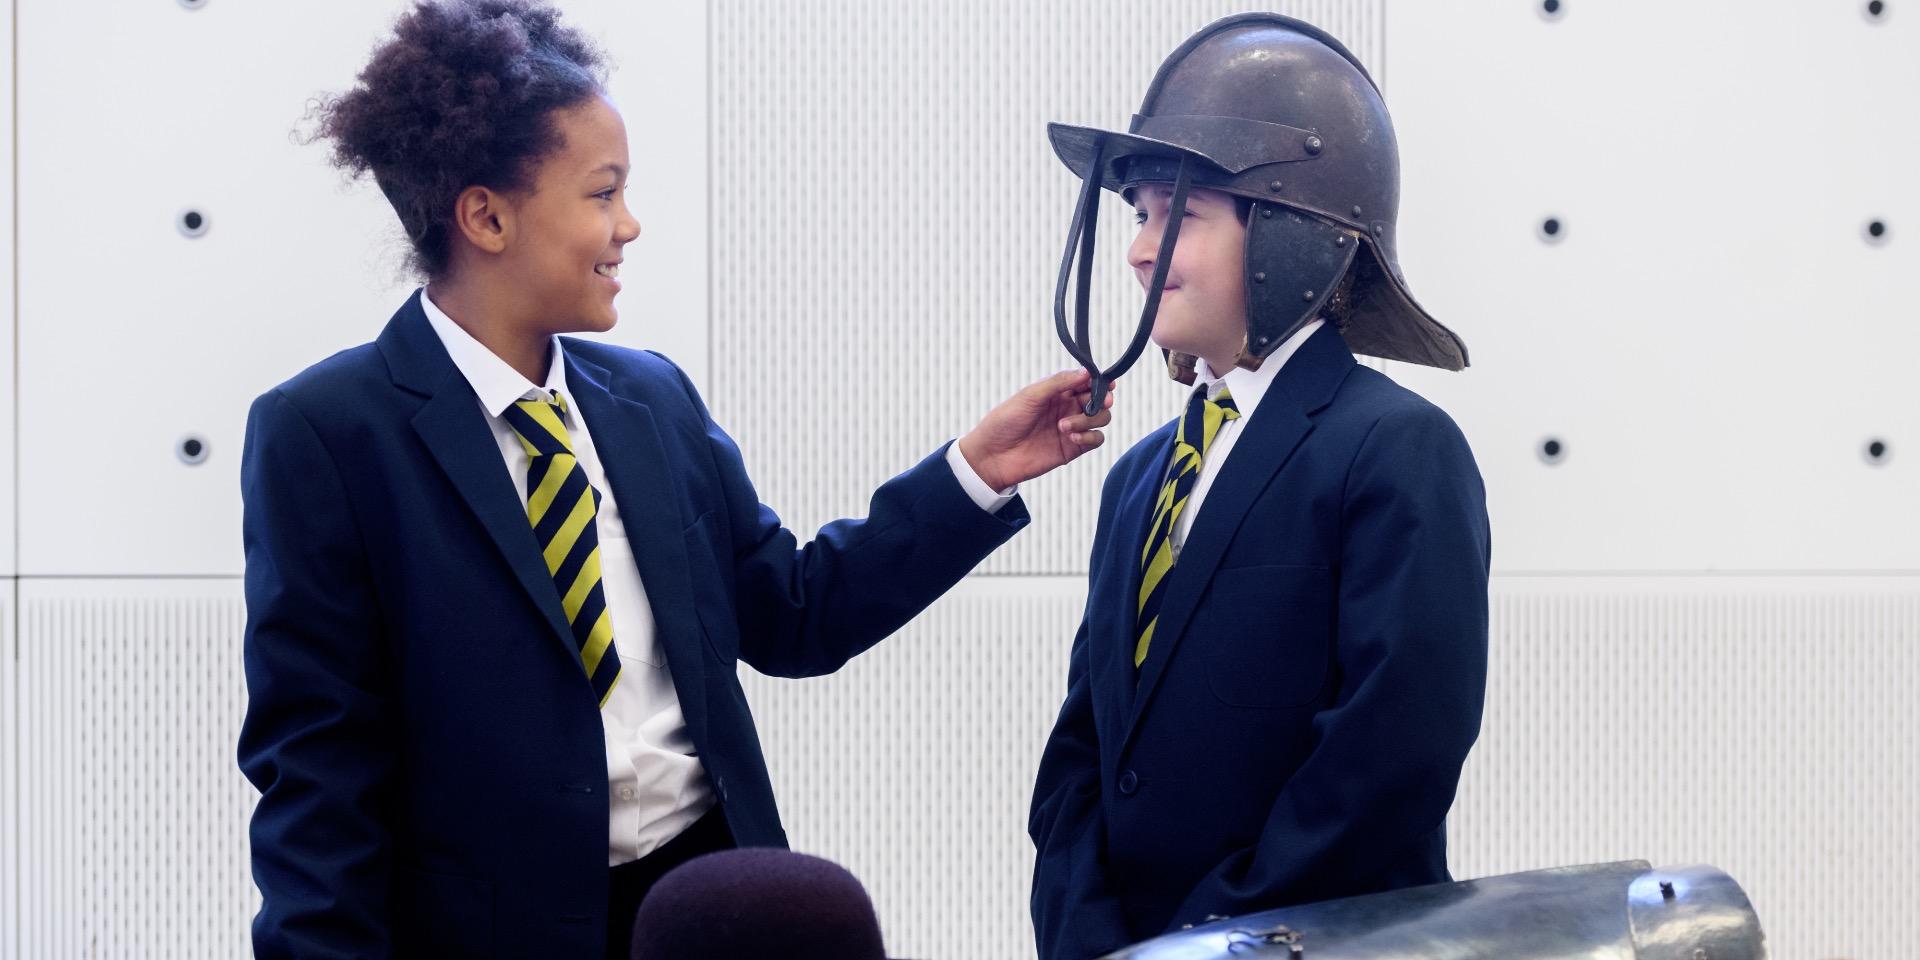 School children examining 17th-century military uniform